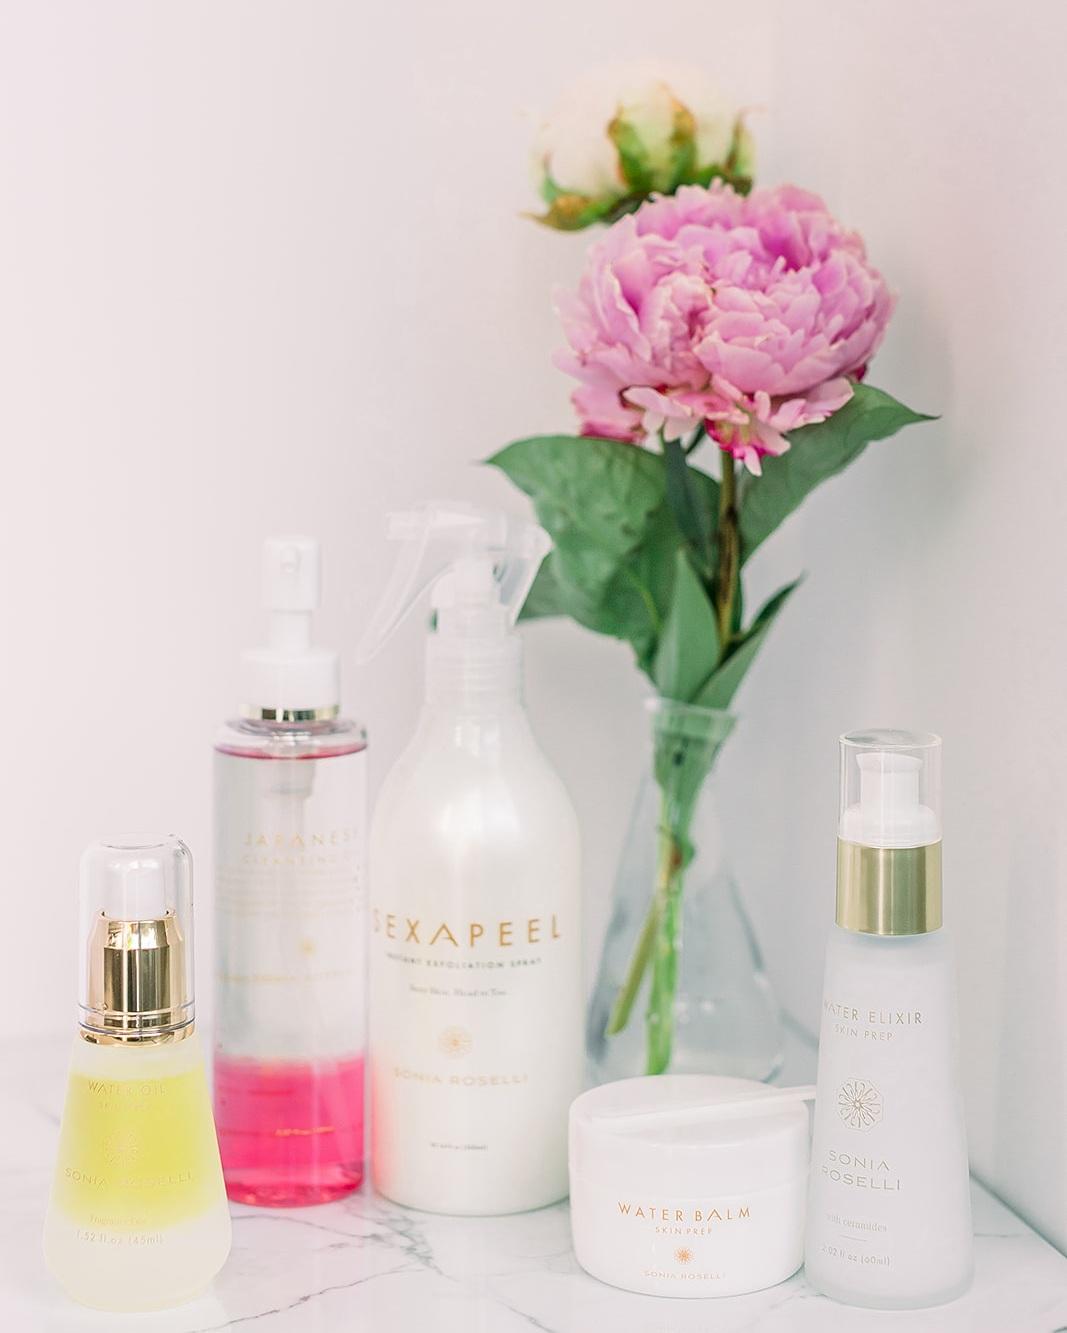 Sonia Roselli's skin care line